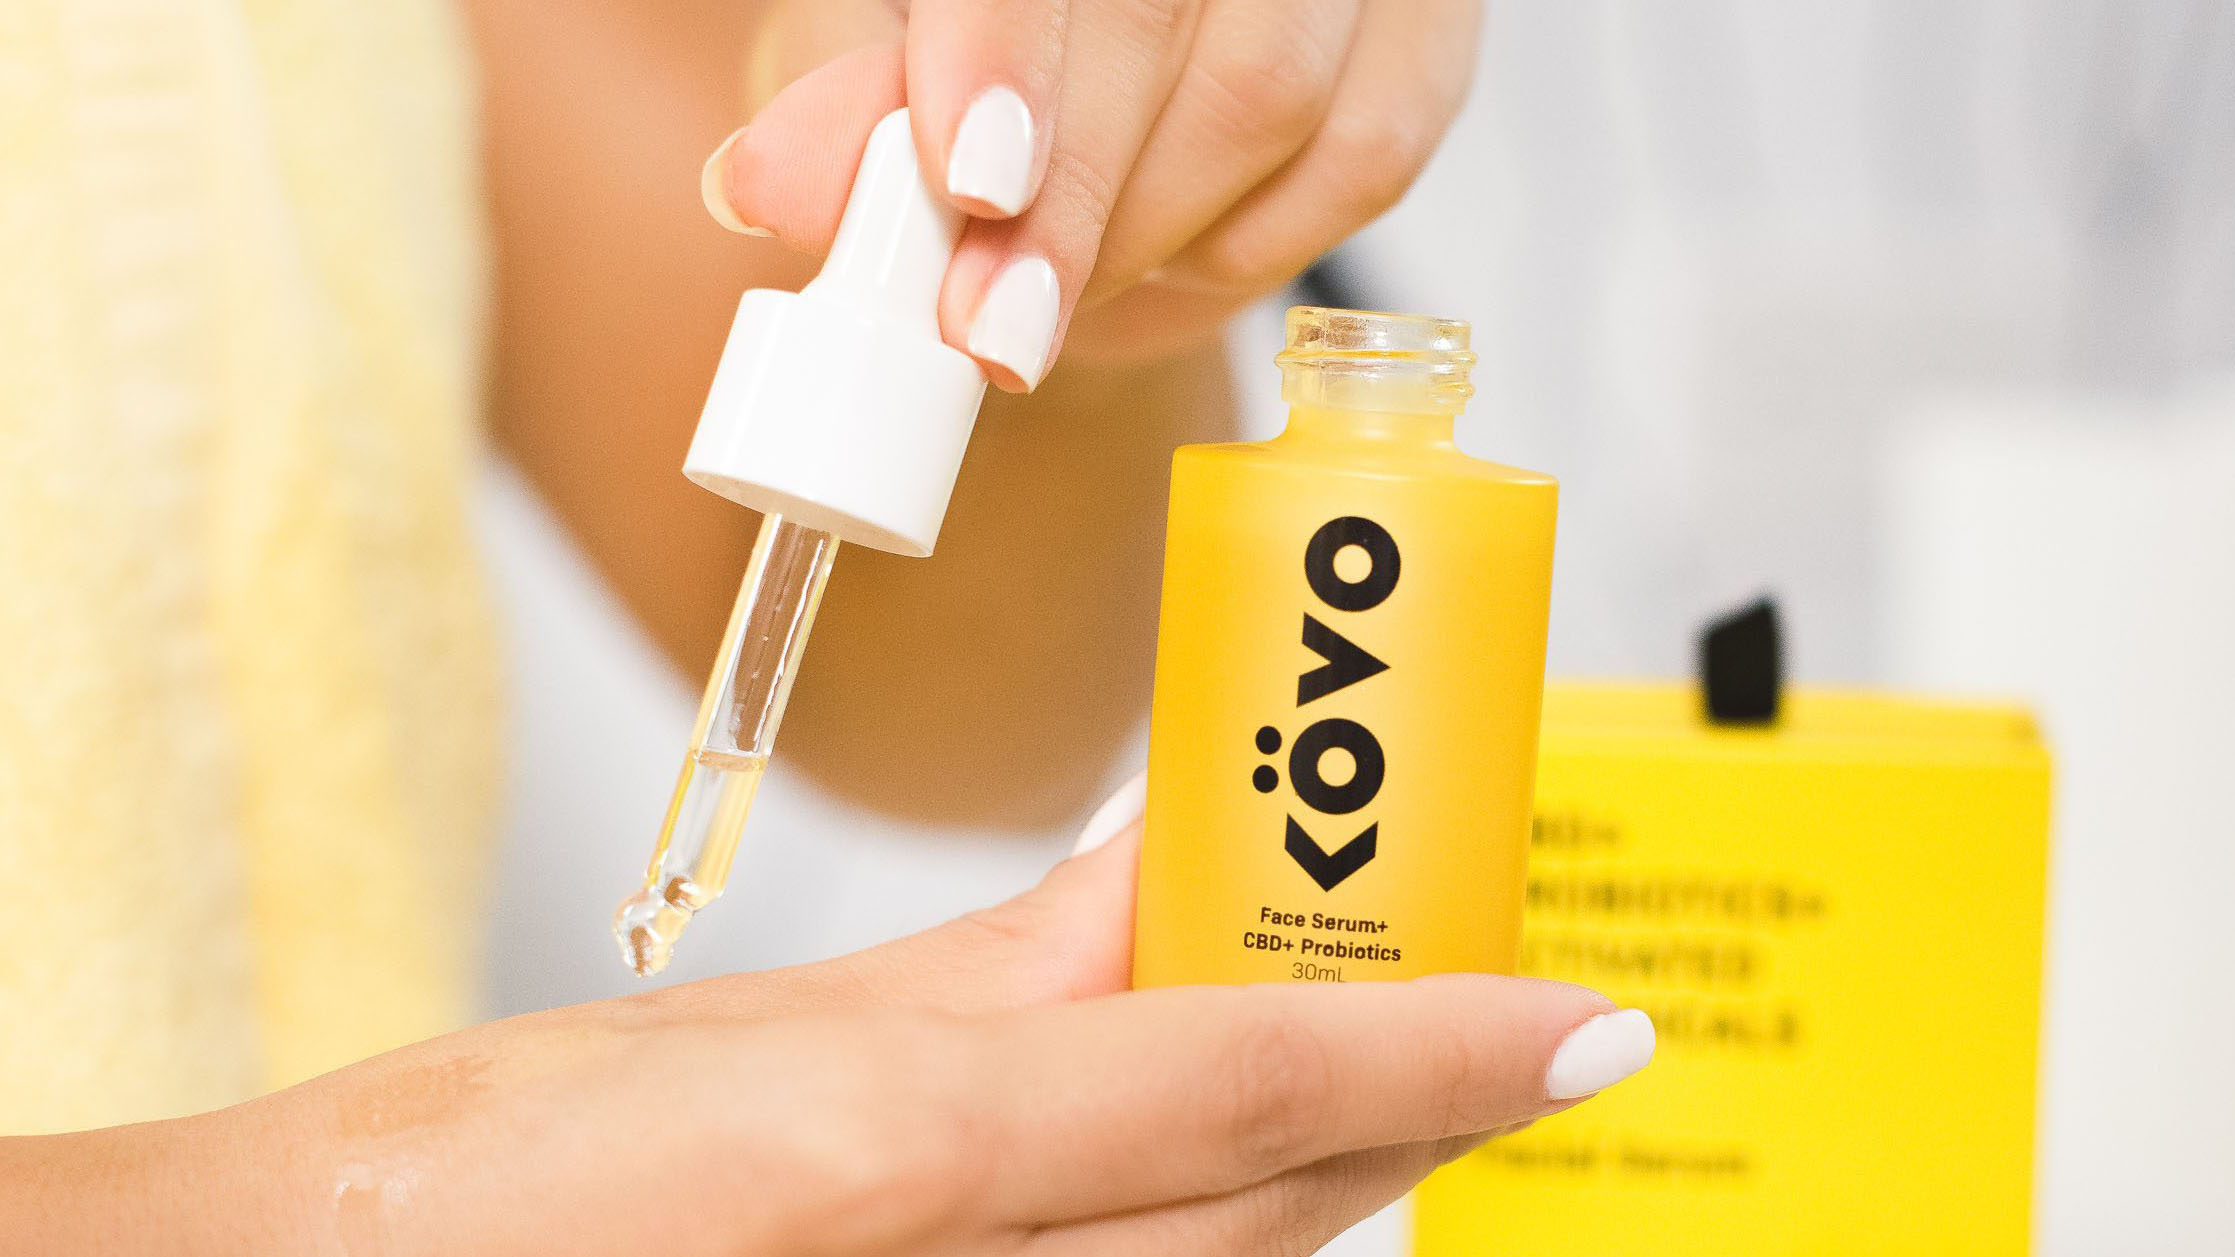 Kovo Brand Image